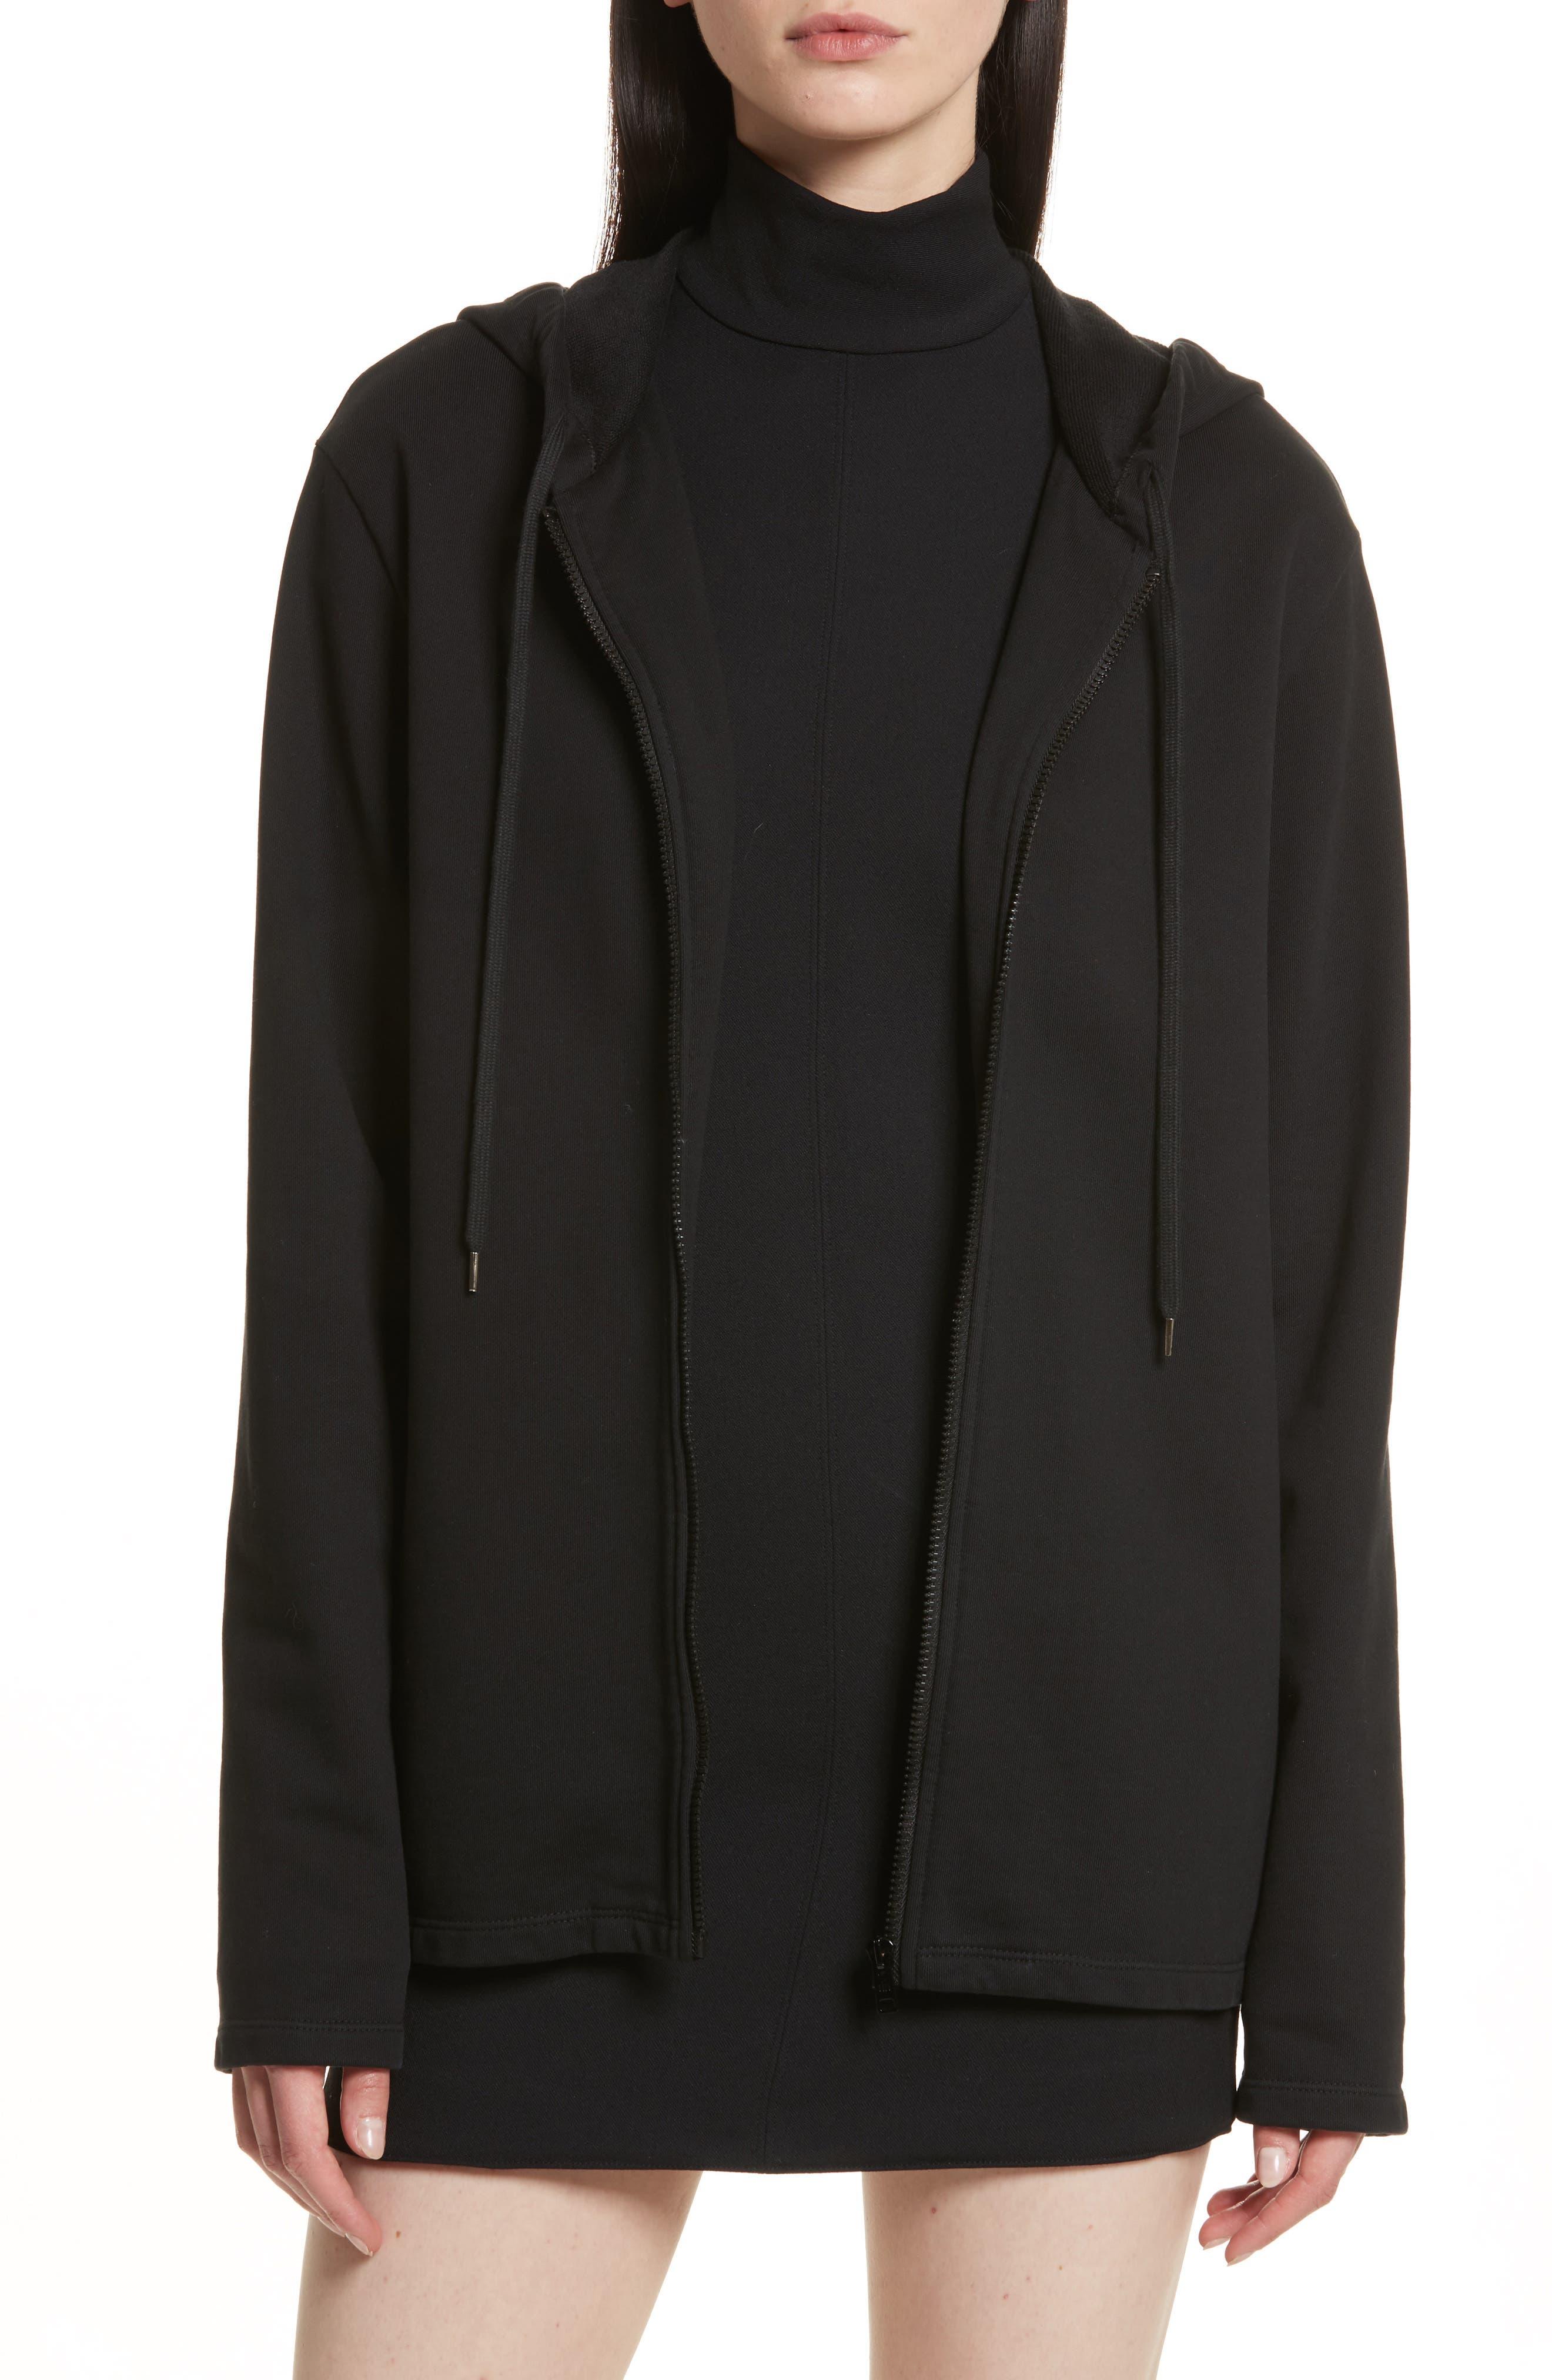 Main Image - Helmut Lang Re-Edition Stud Collar Hoodie